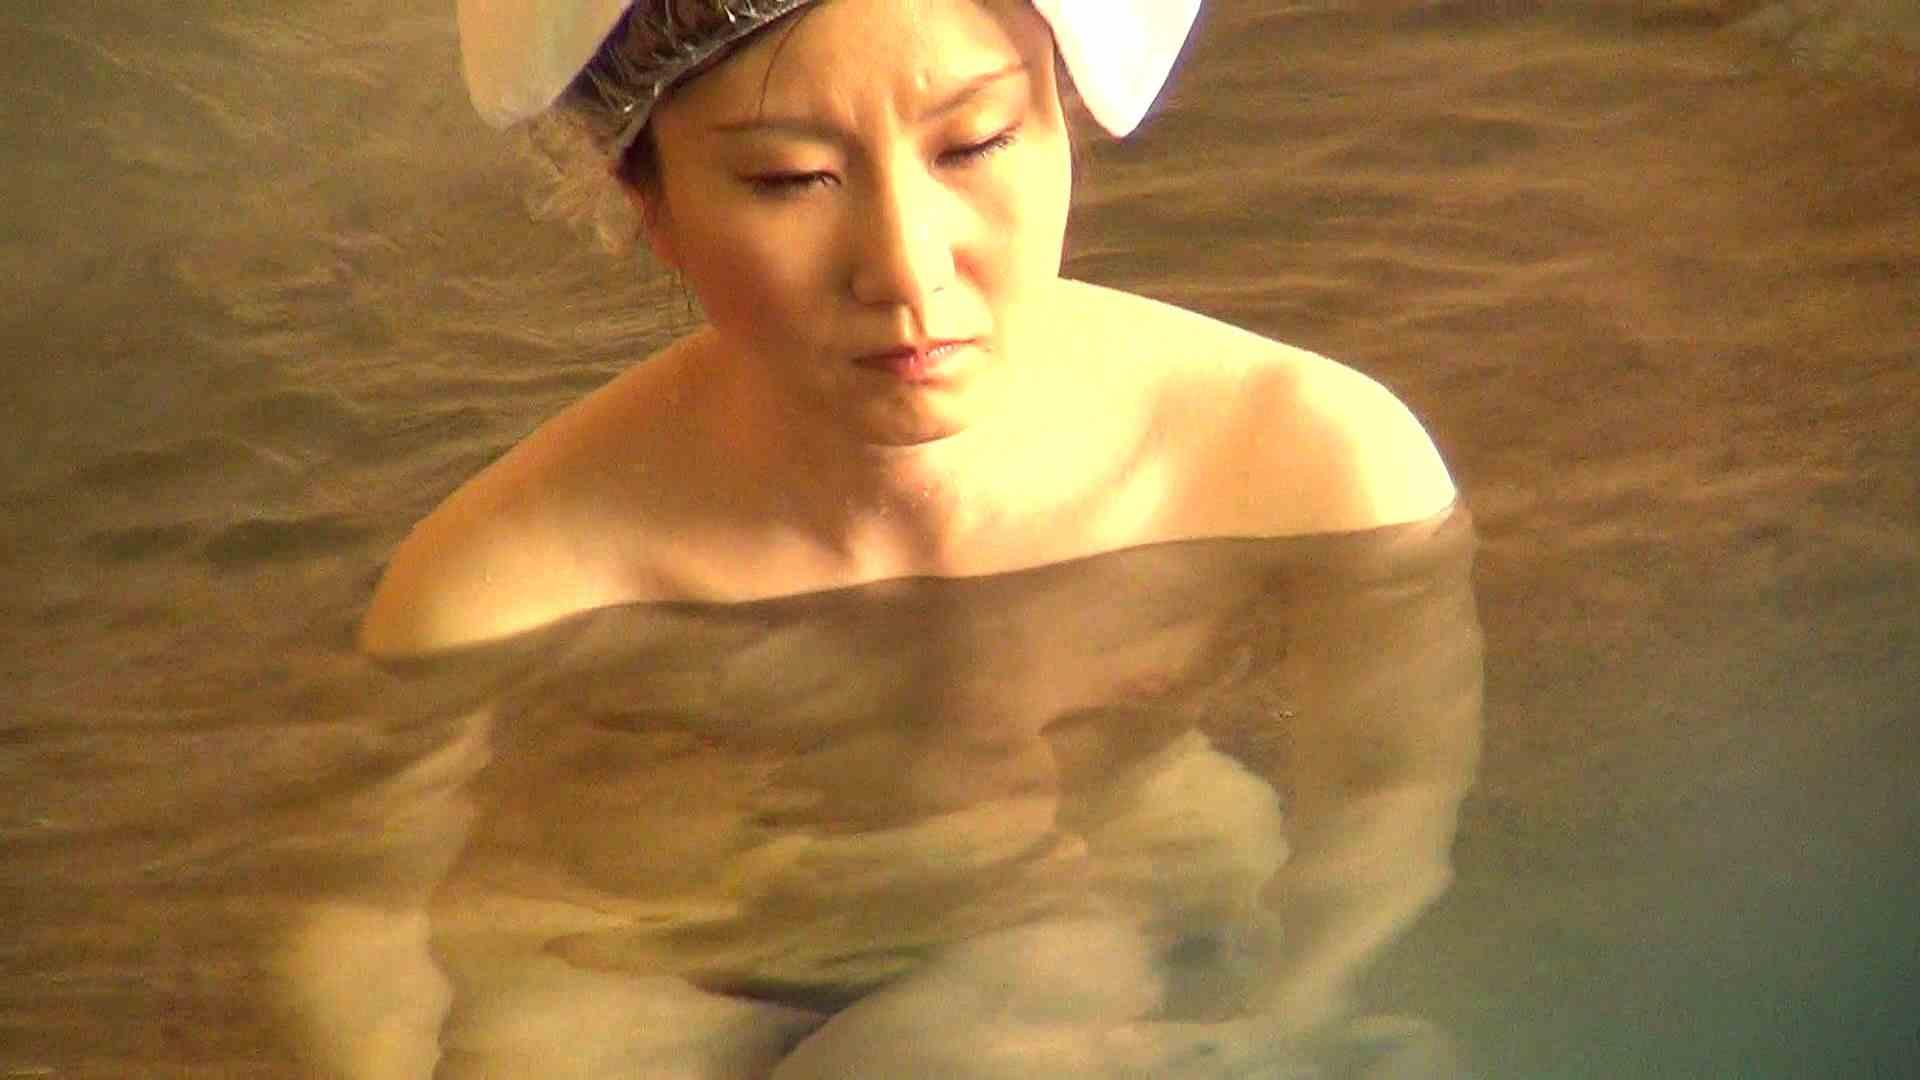 Aquaな露天風呂Vol.278 盗撮大放出 戯れ無修正画像 88連発 53